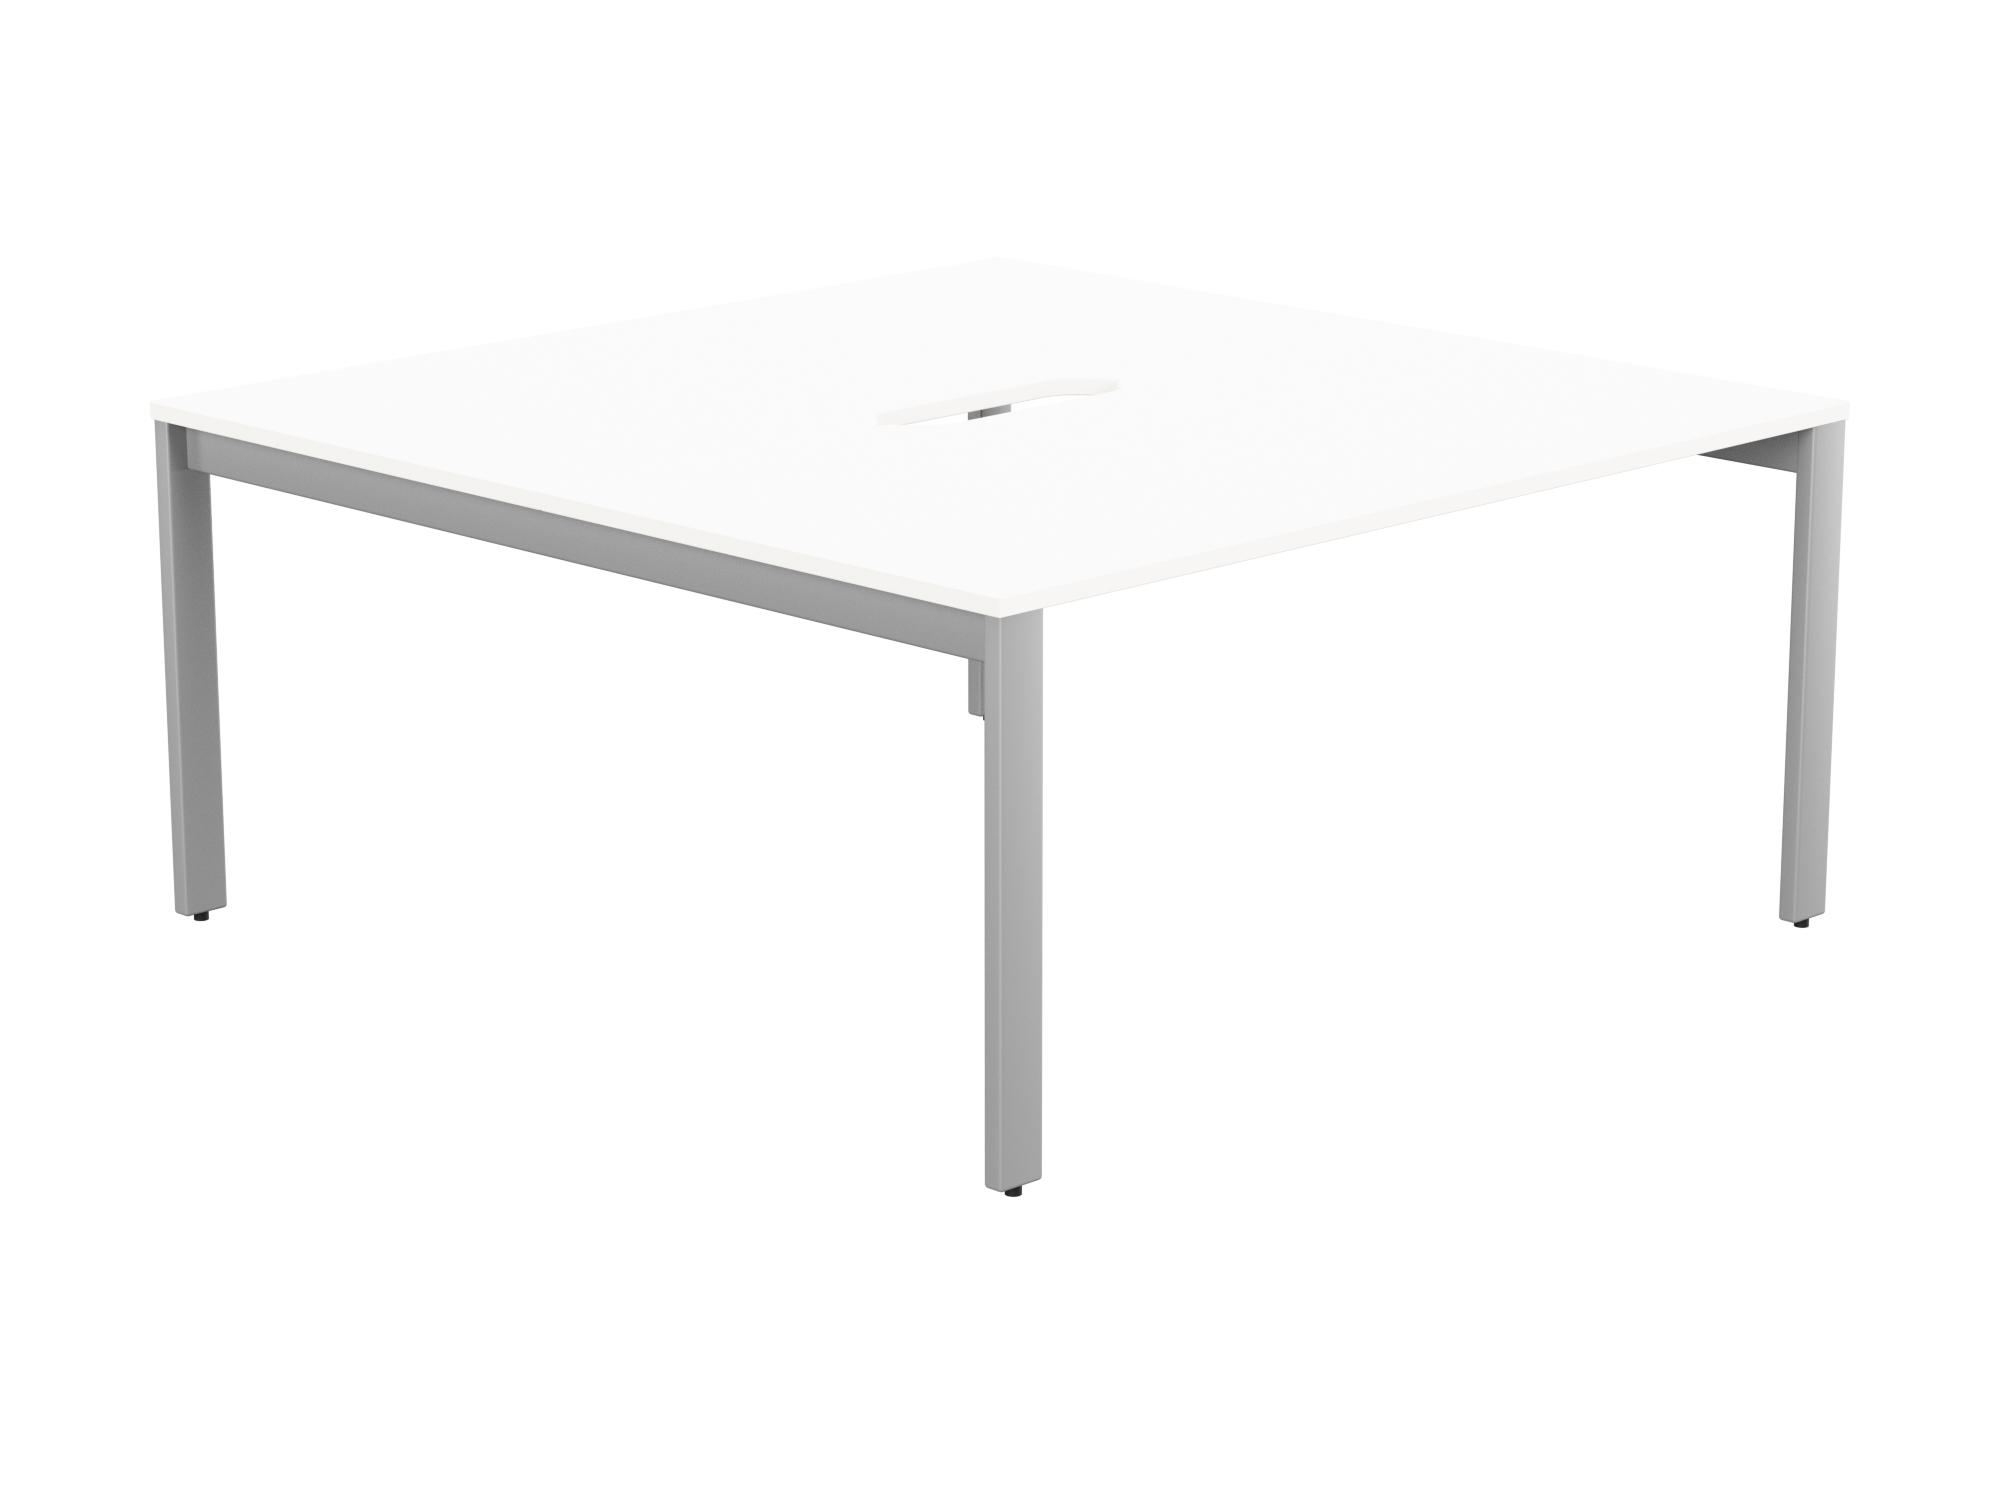 Switch 2 Person Bench Open Leg Scallop Top 1600 x 800 - Silver Frame / White Top